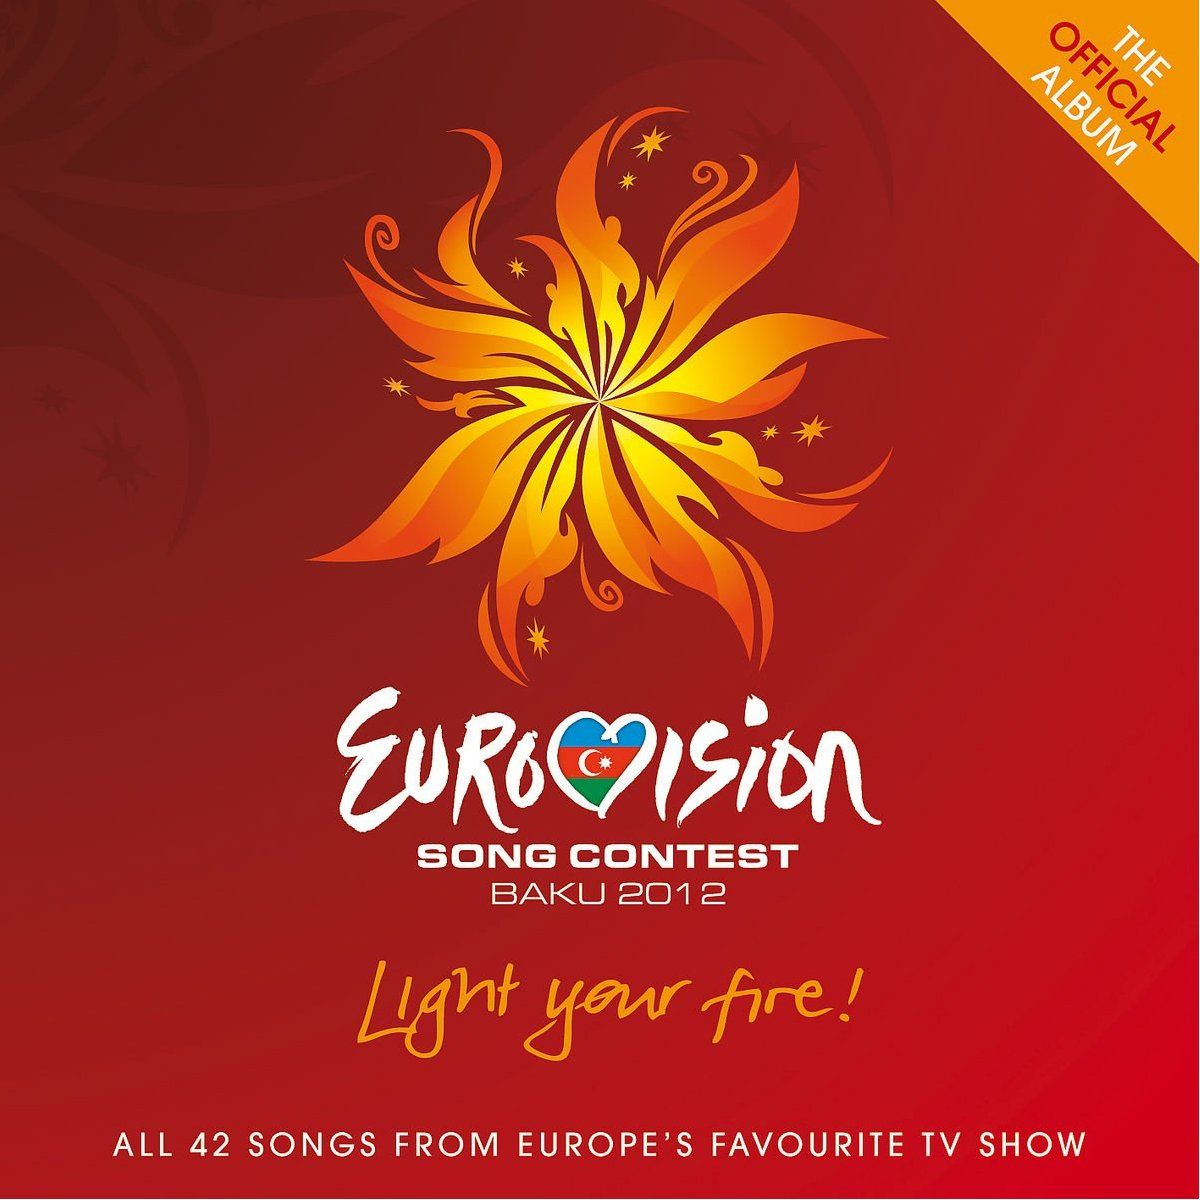 Various Artists - Eurovision Song Contest - Baku 2012 album cover